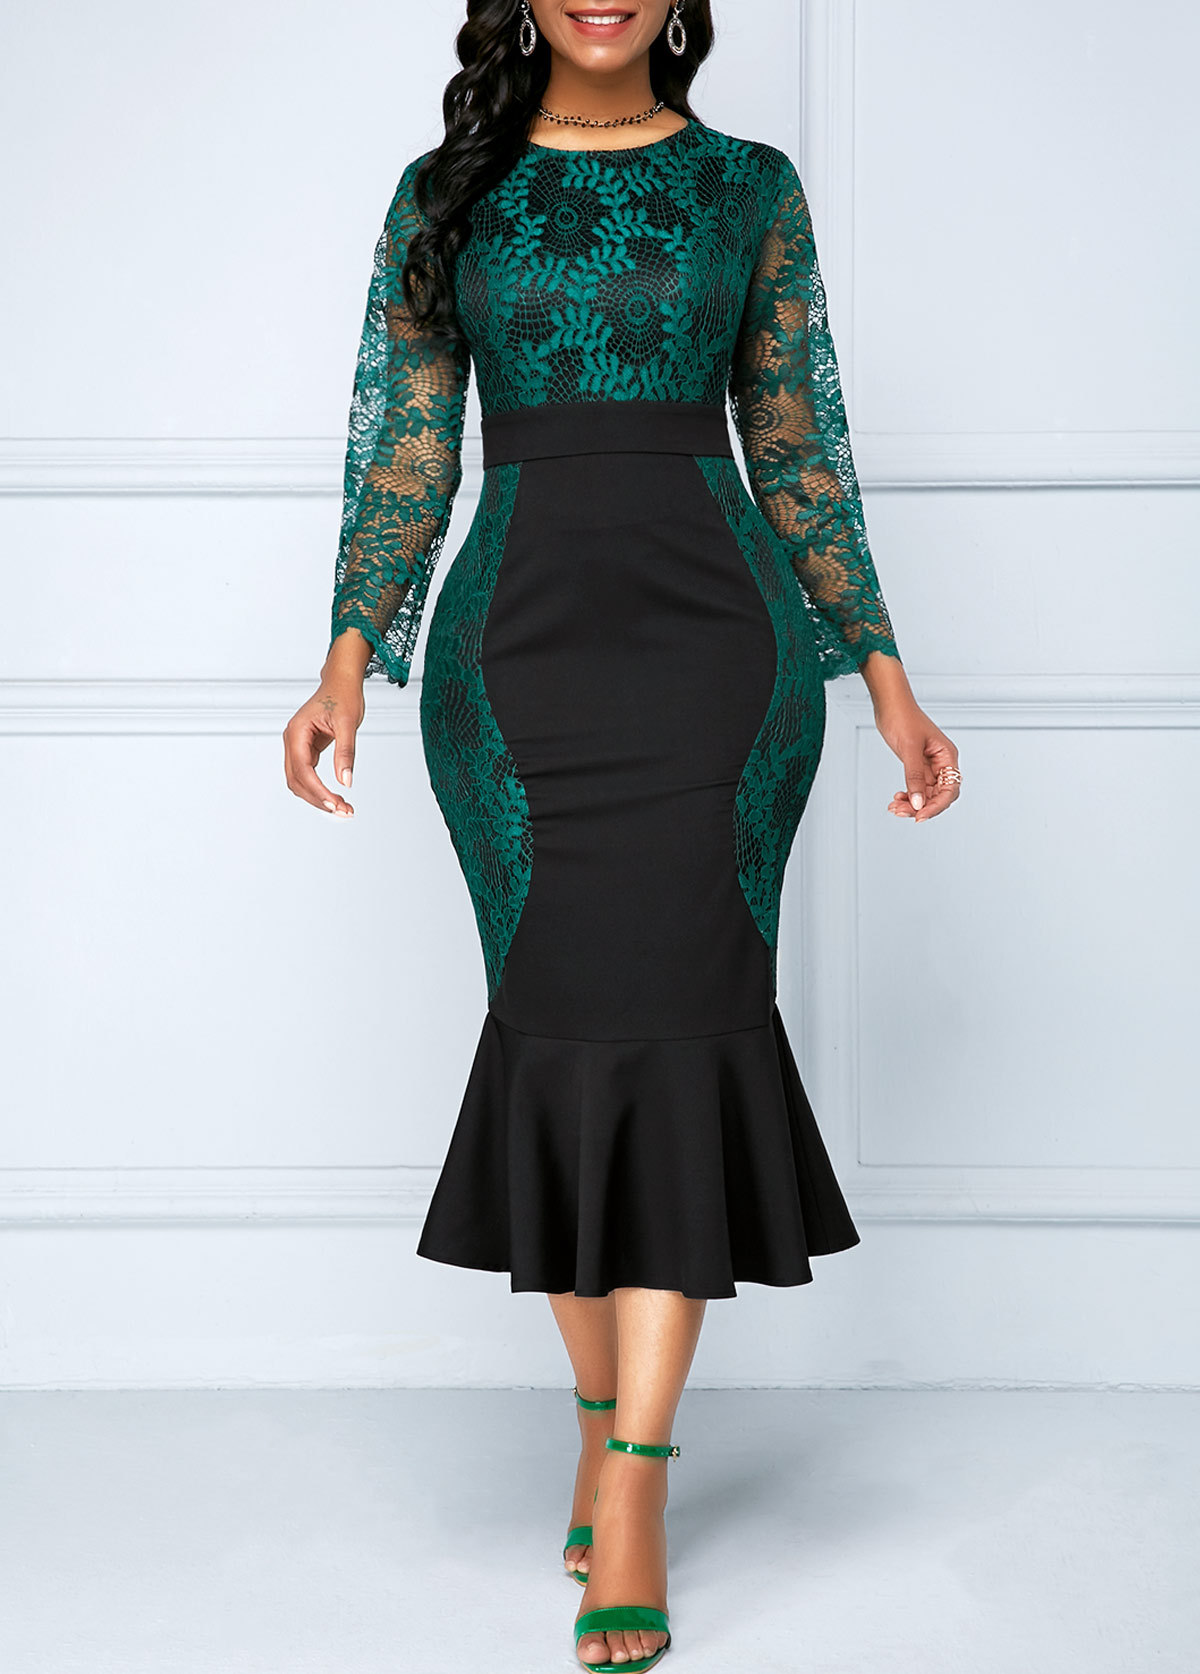 Large Size O-neck High Women Dress